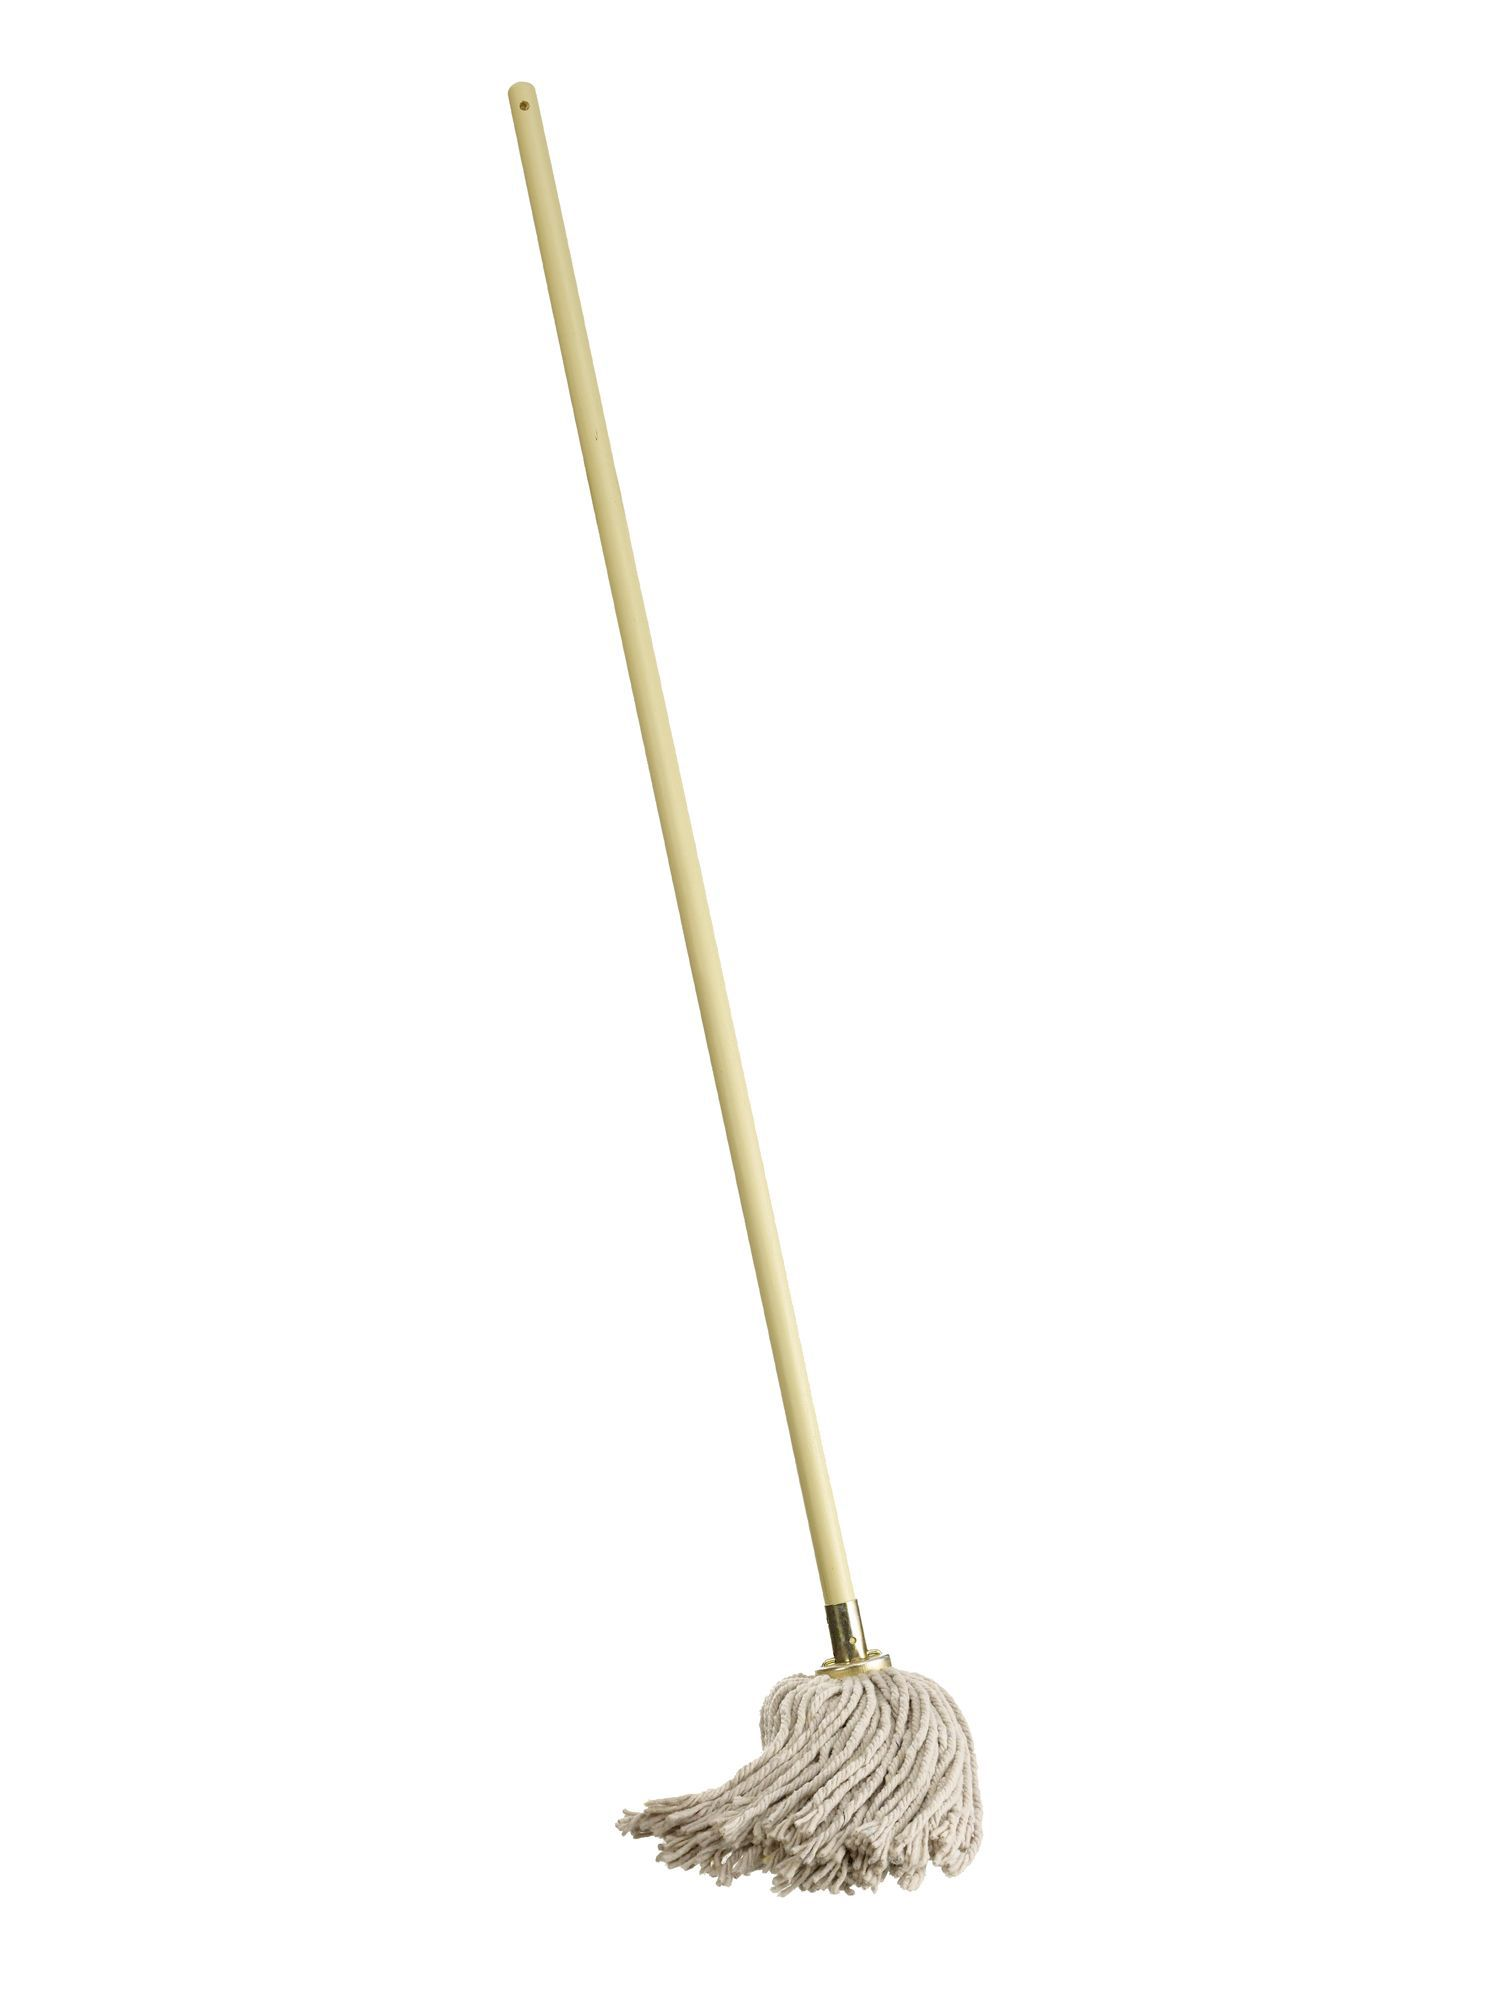 harris cream lily brown mop departments diy at b q. Black Bedroom Furniture Sets. Home Design Ideas